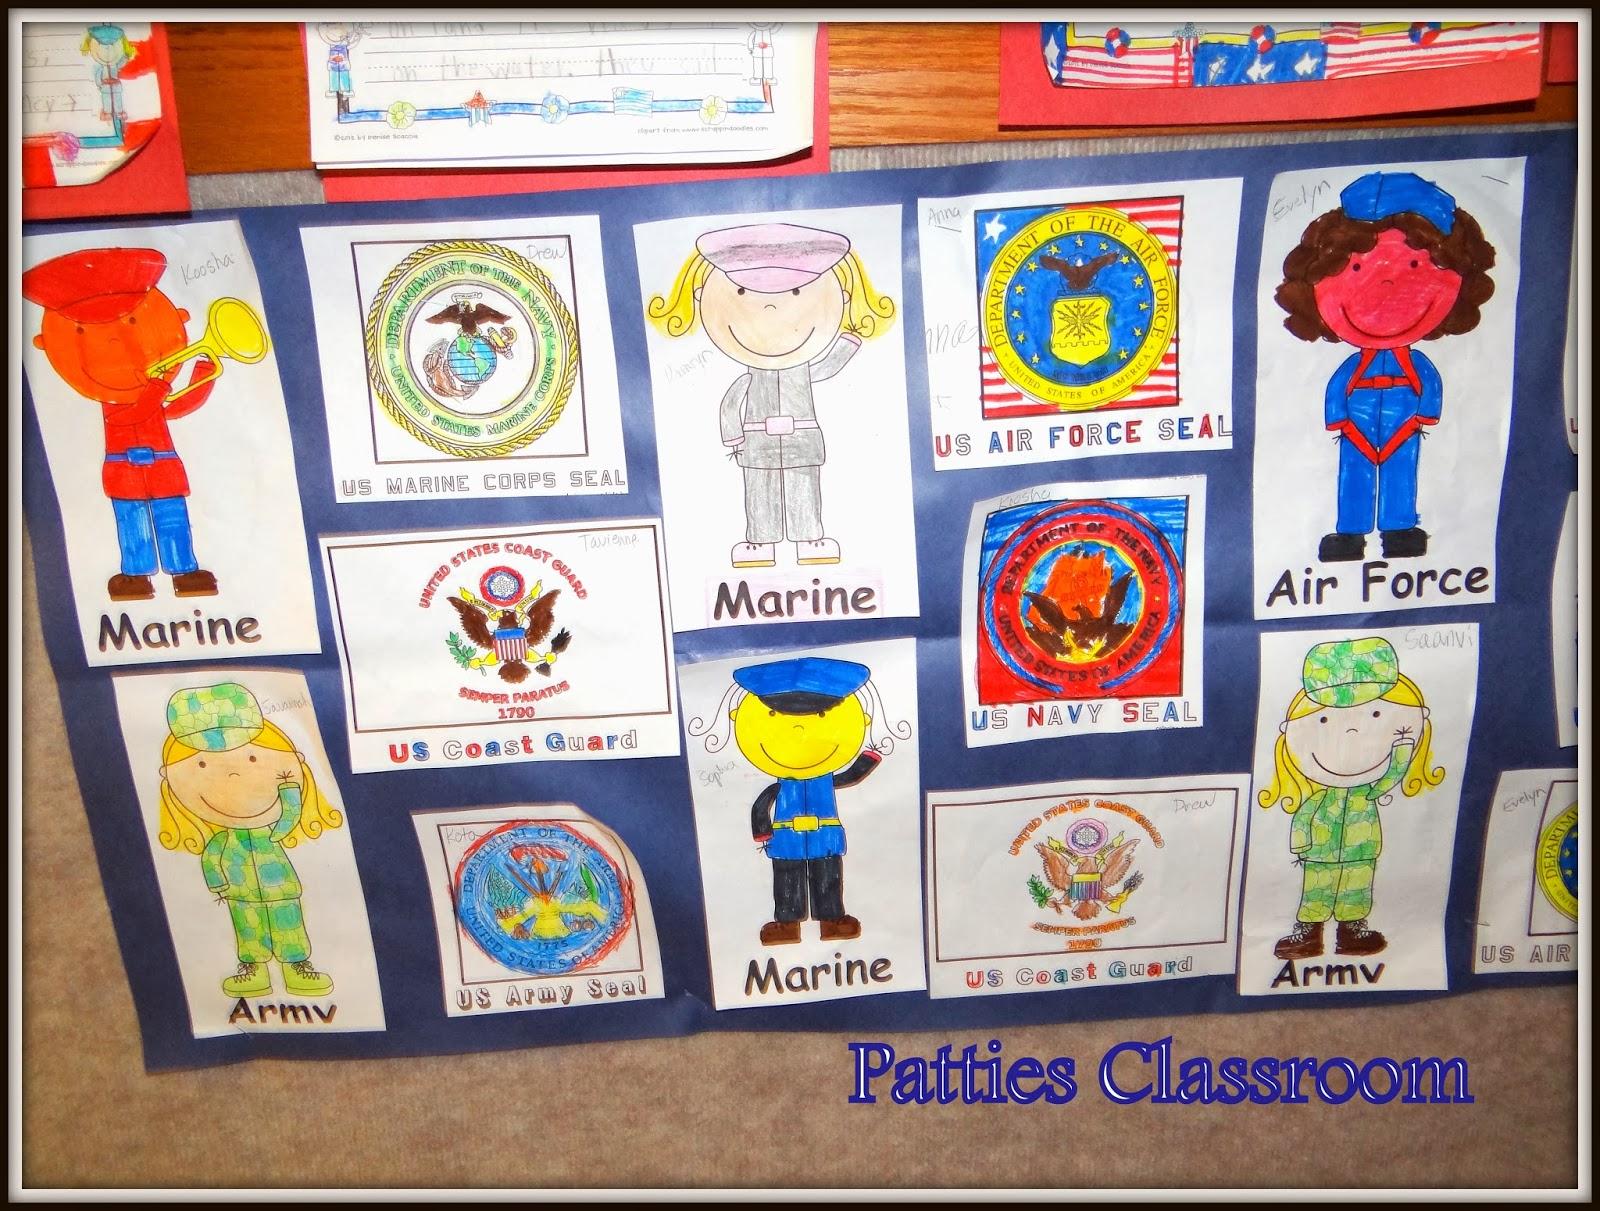 Patties Classroom Veterans Day Art And Activities For Kids